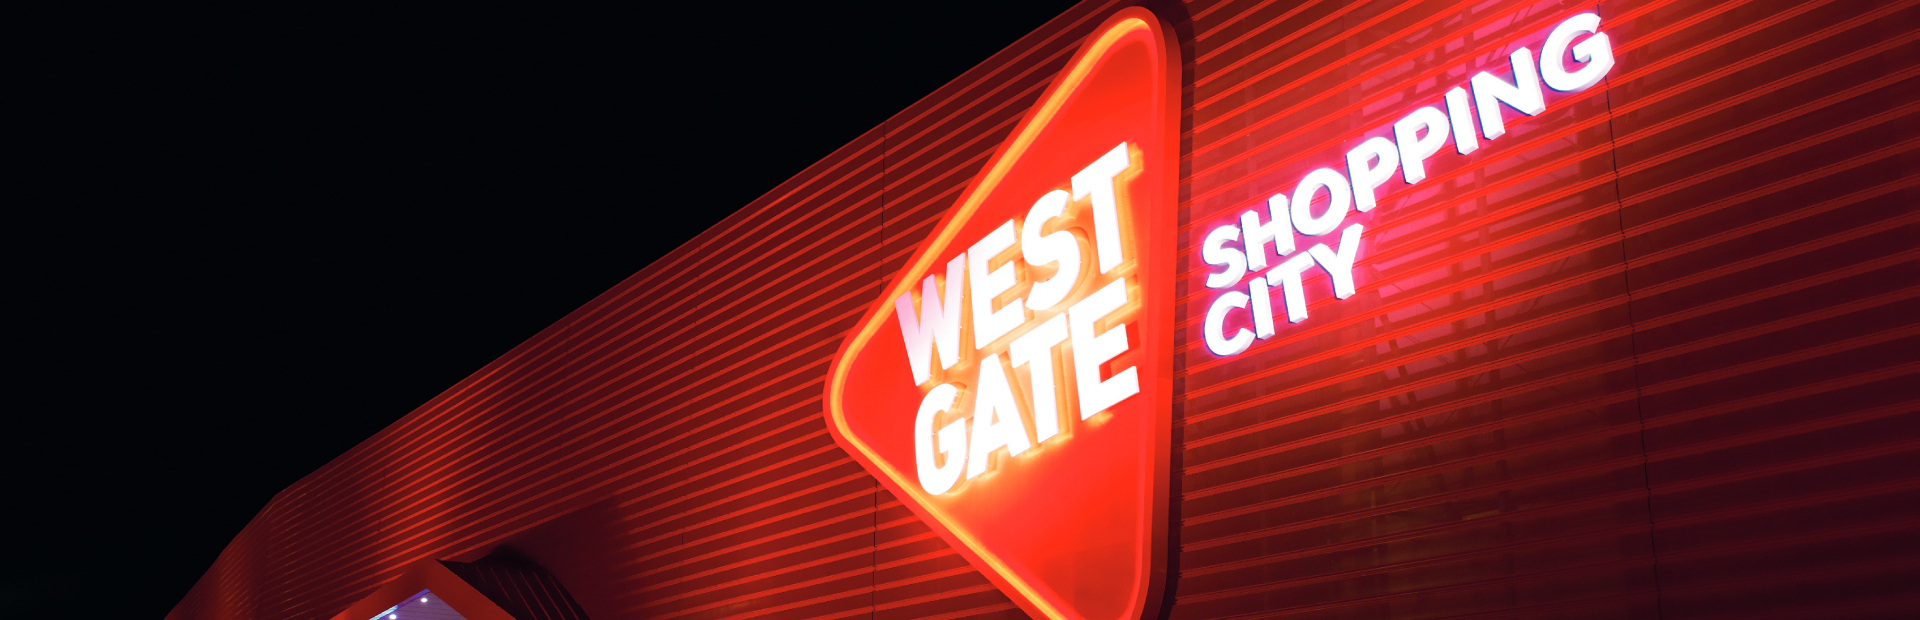 O Westgateu